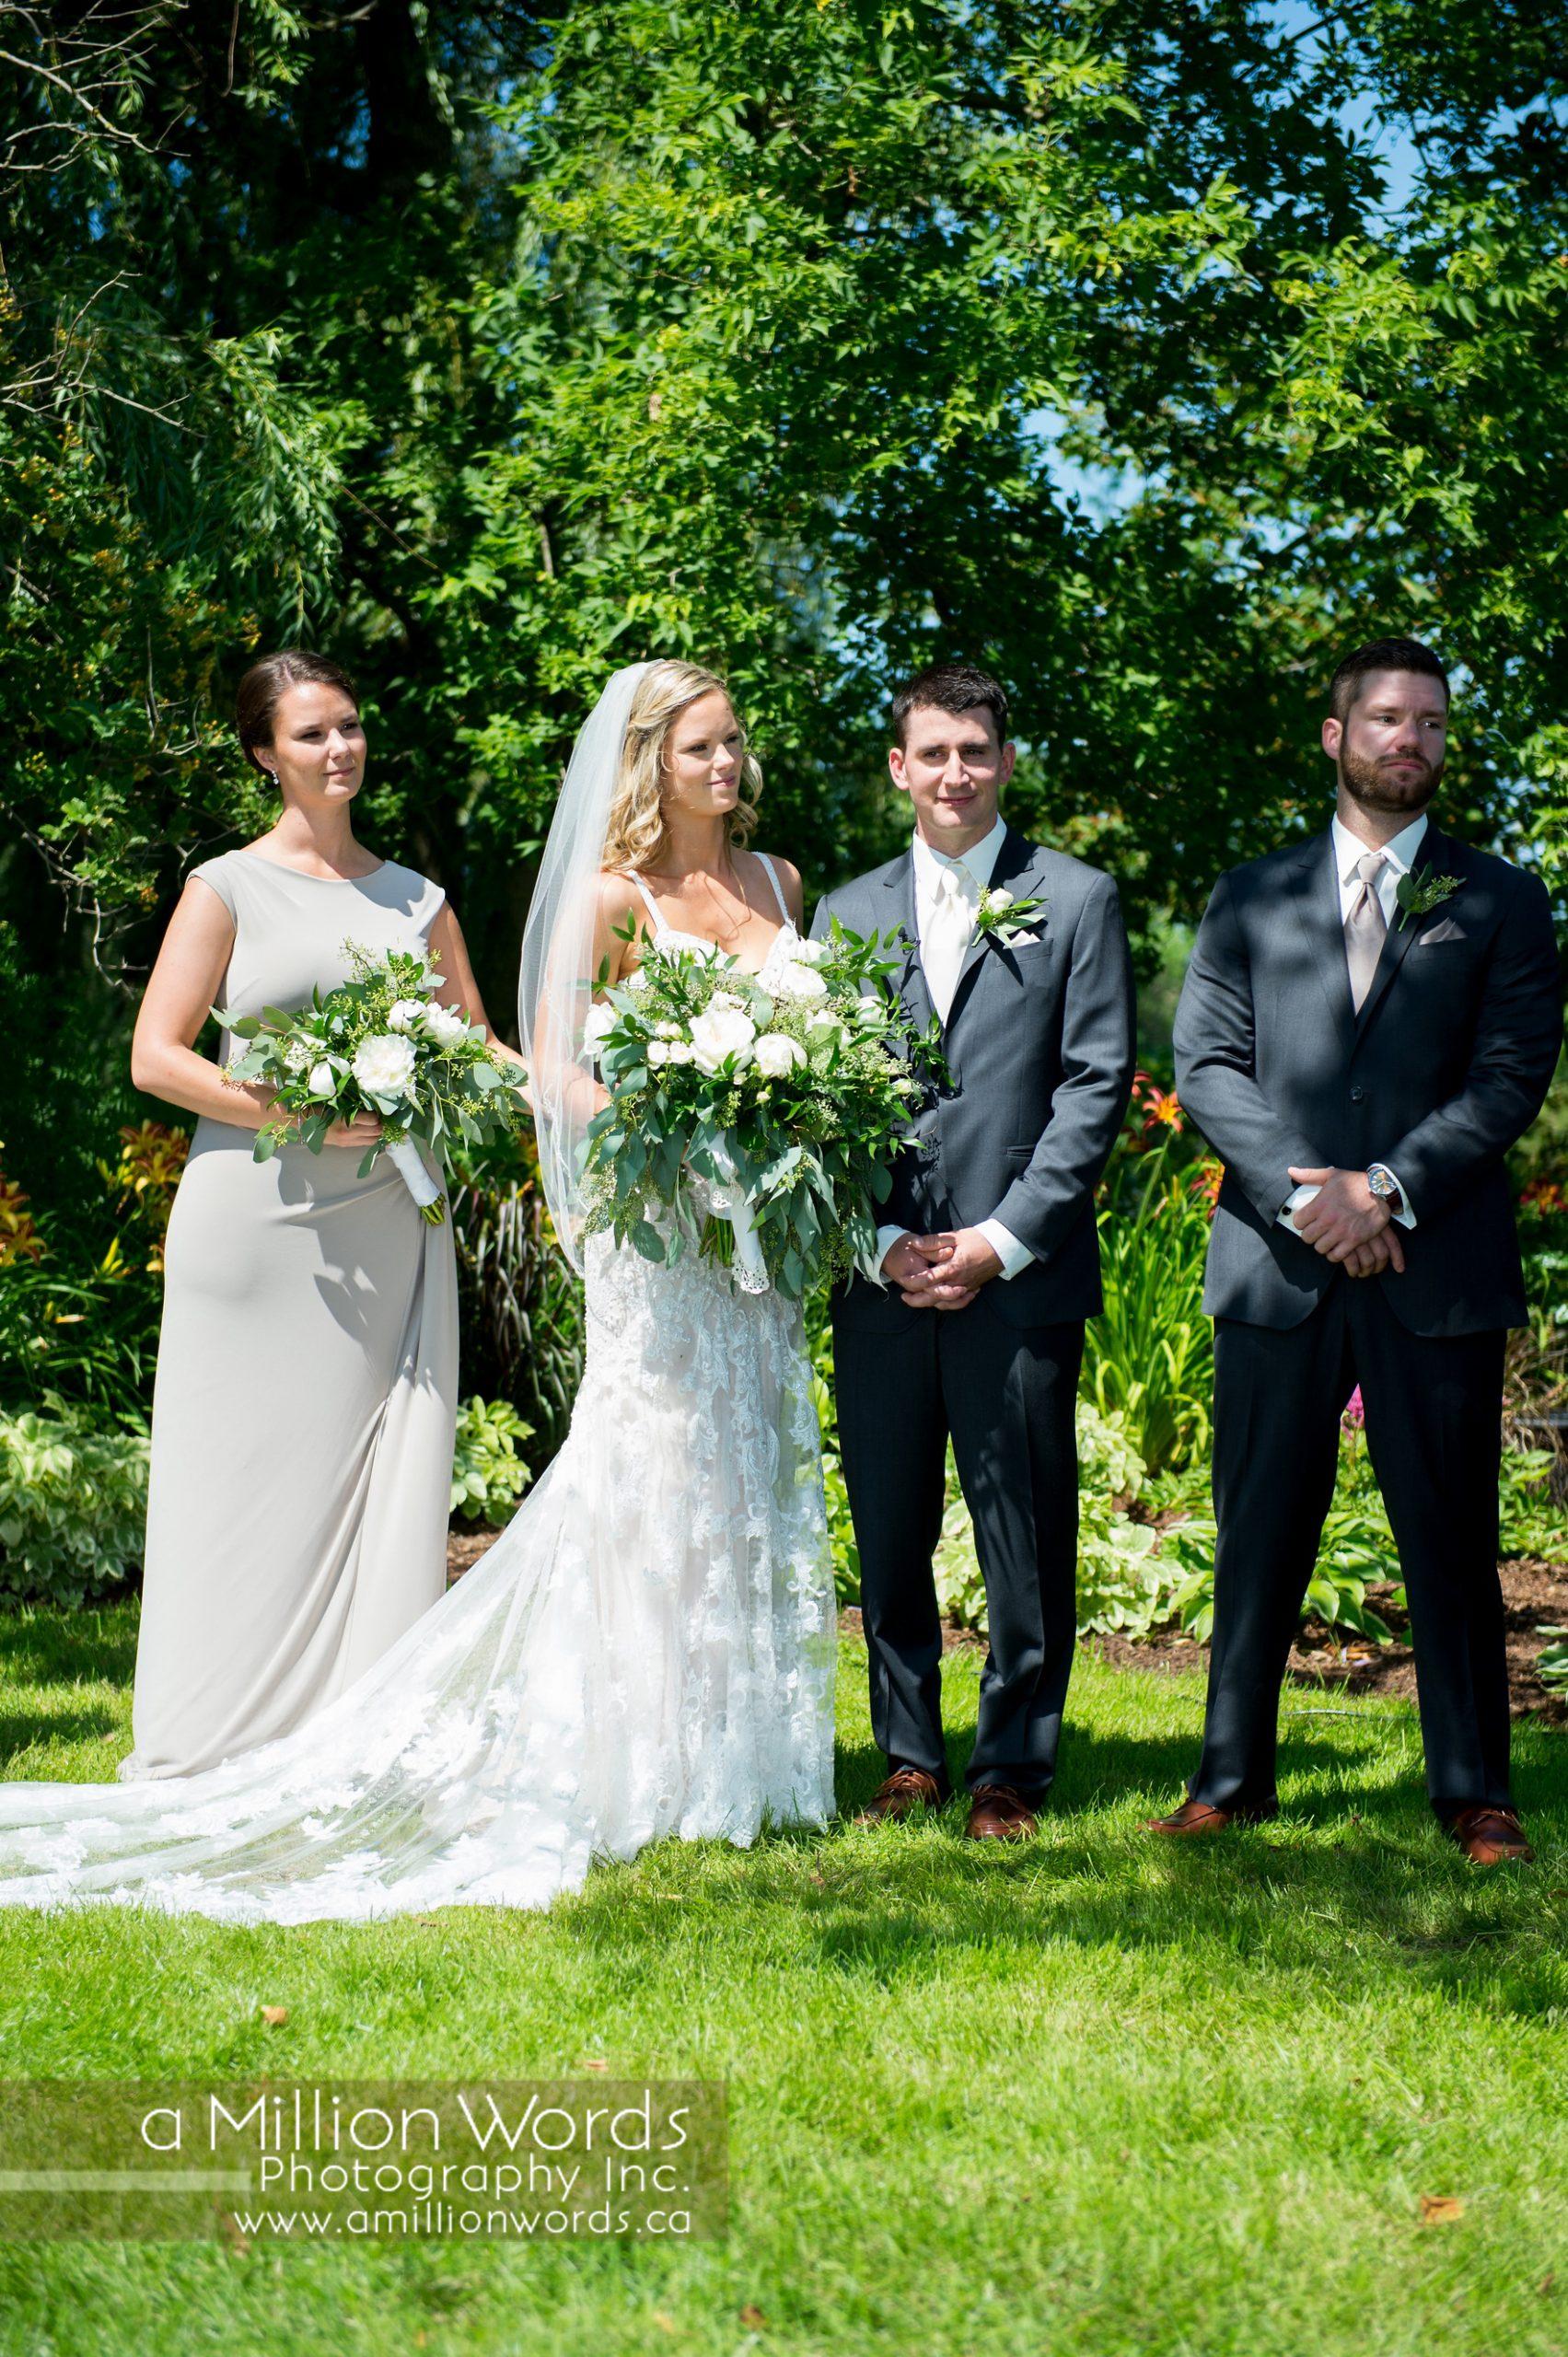 arthur_wedding_photographer30